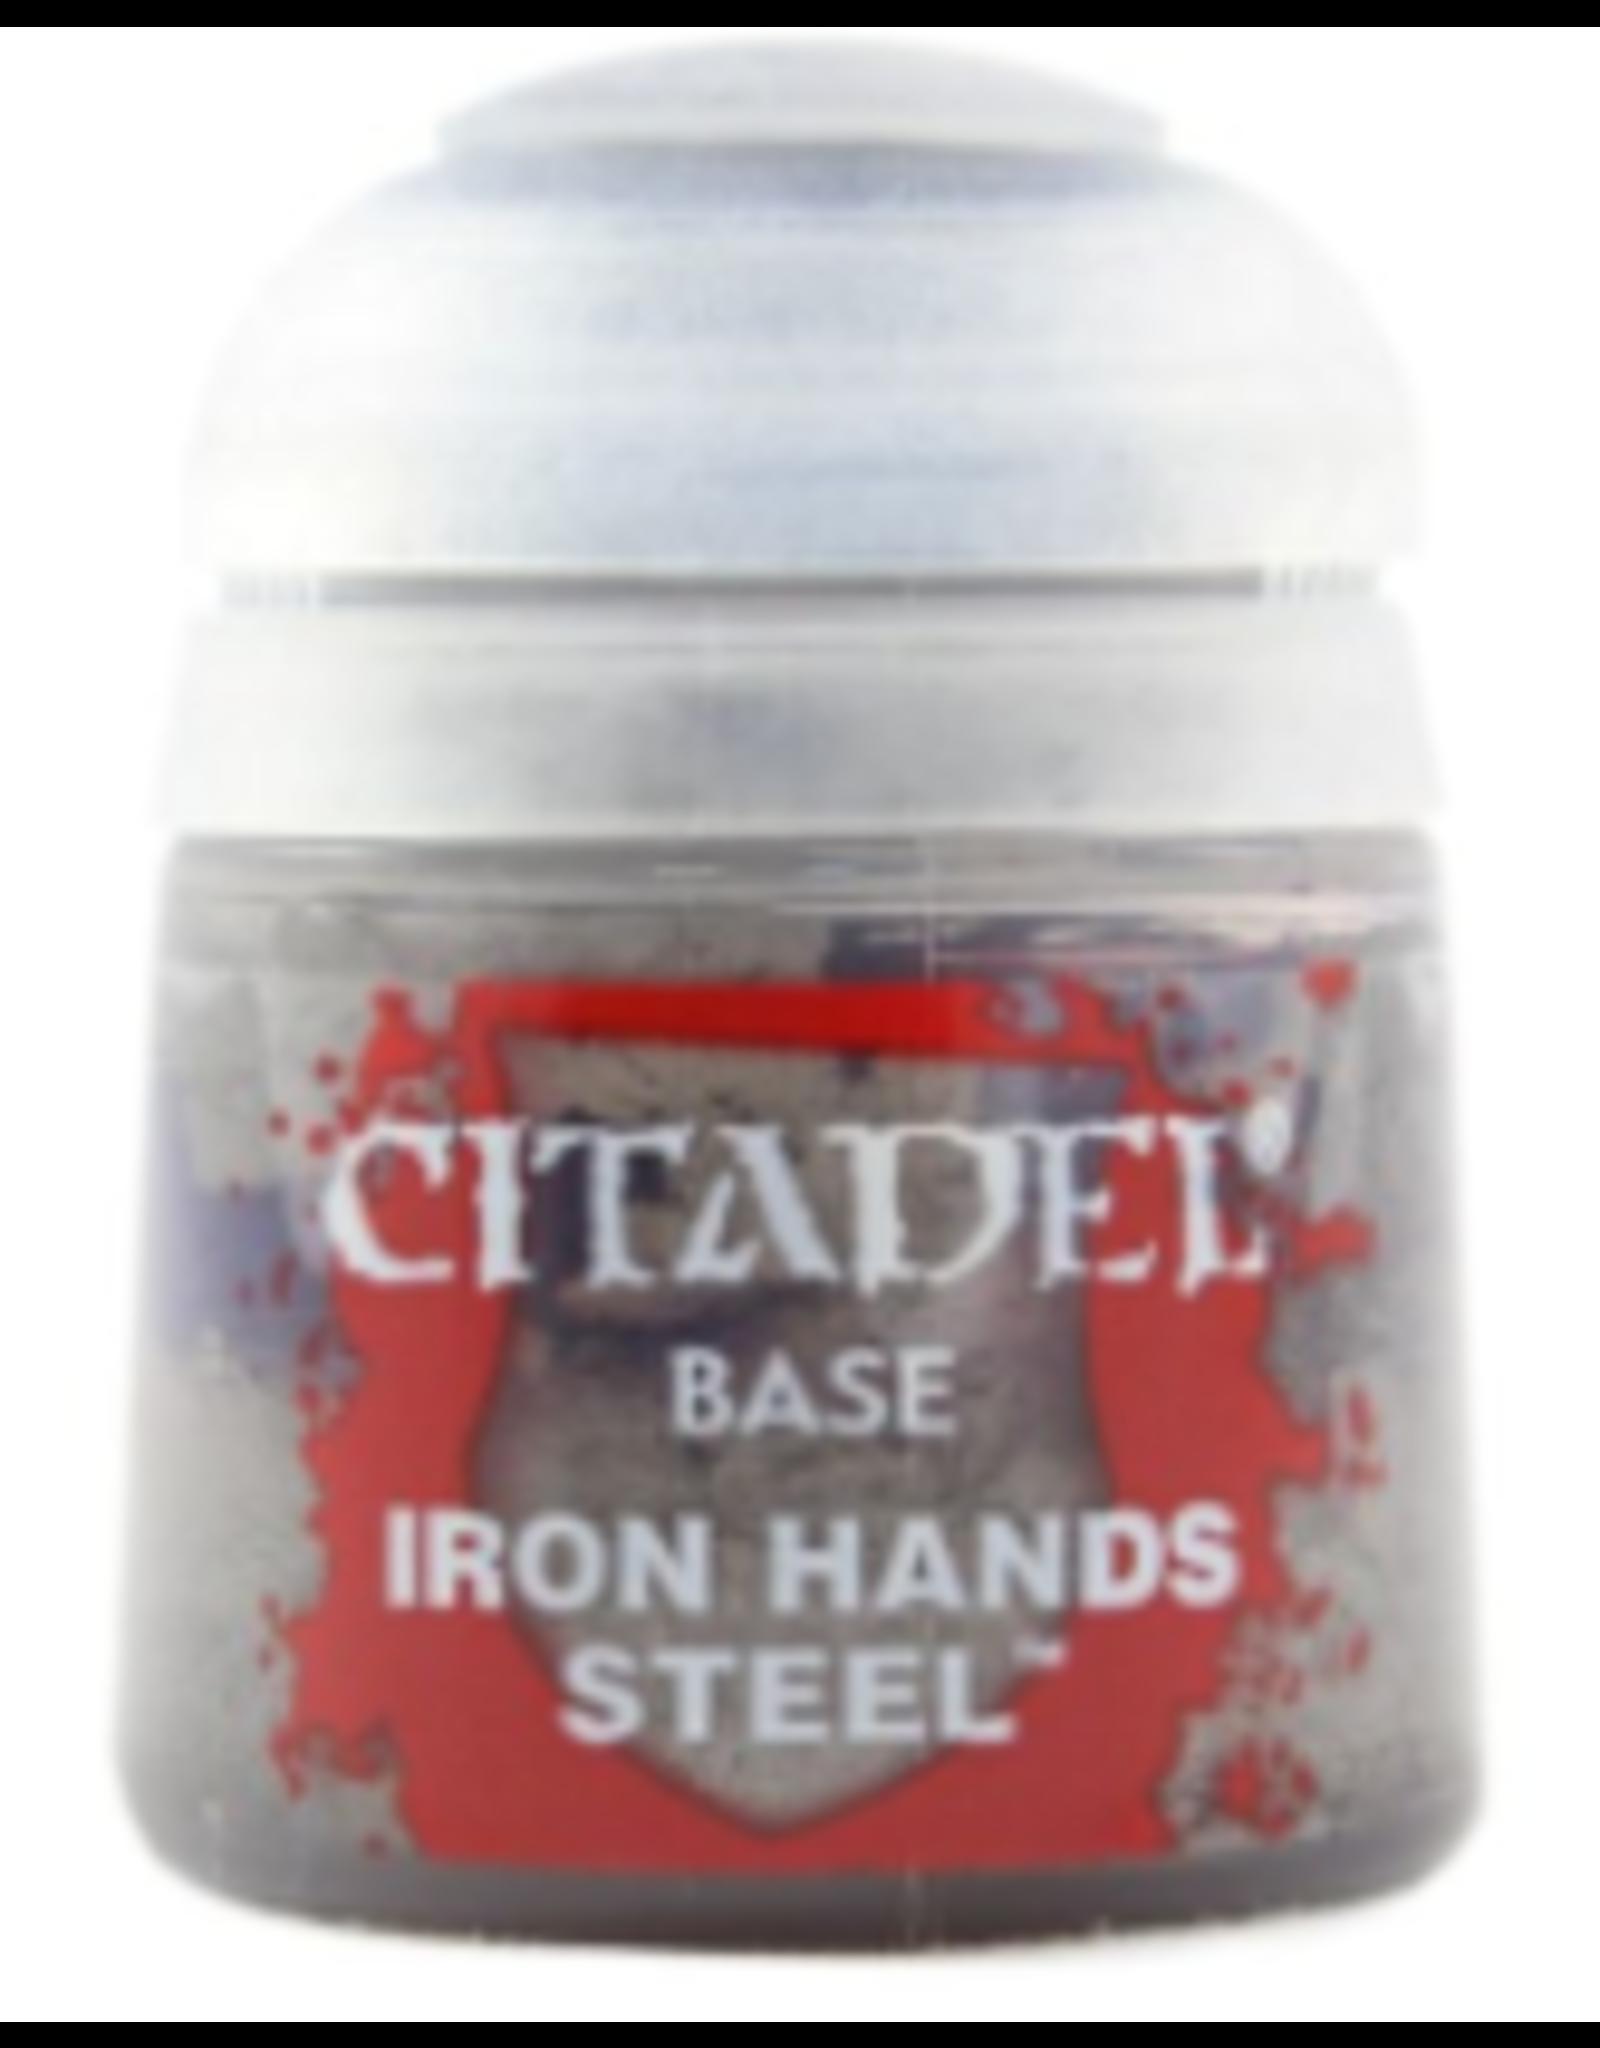 Games Workshop BASE: IRON HANDS STEEL (12ML)